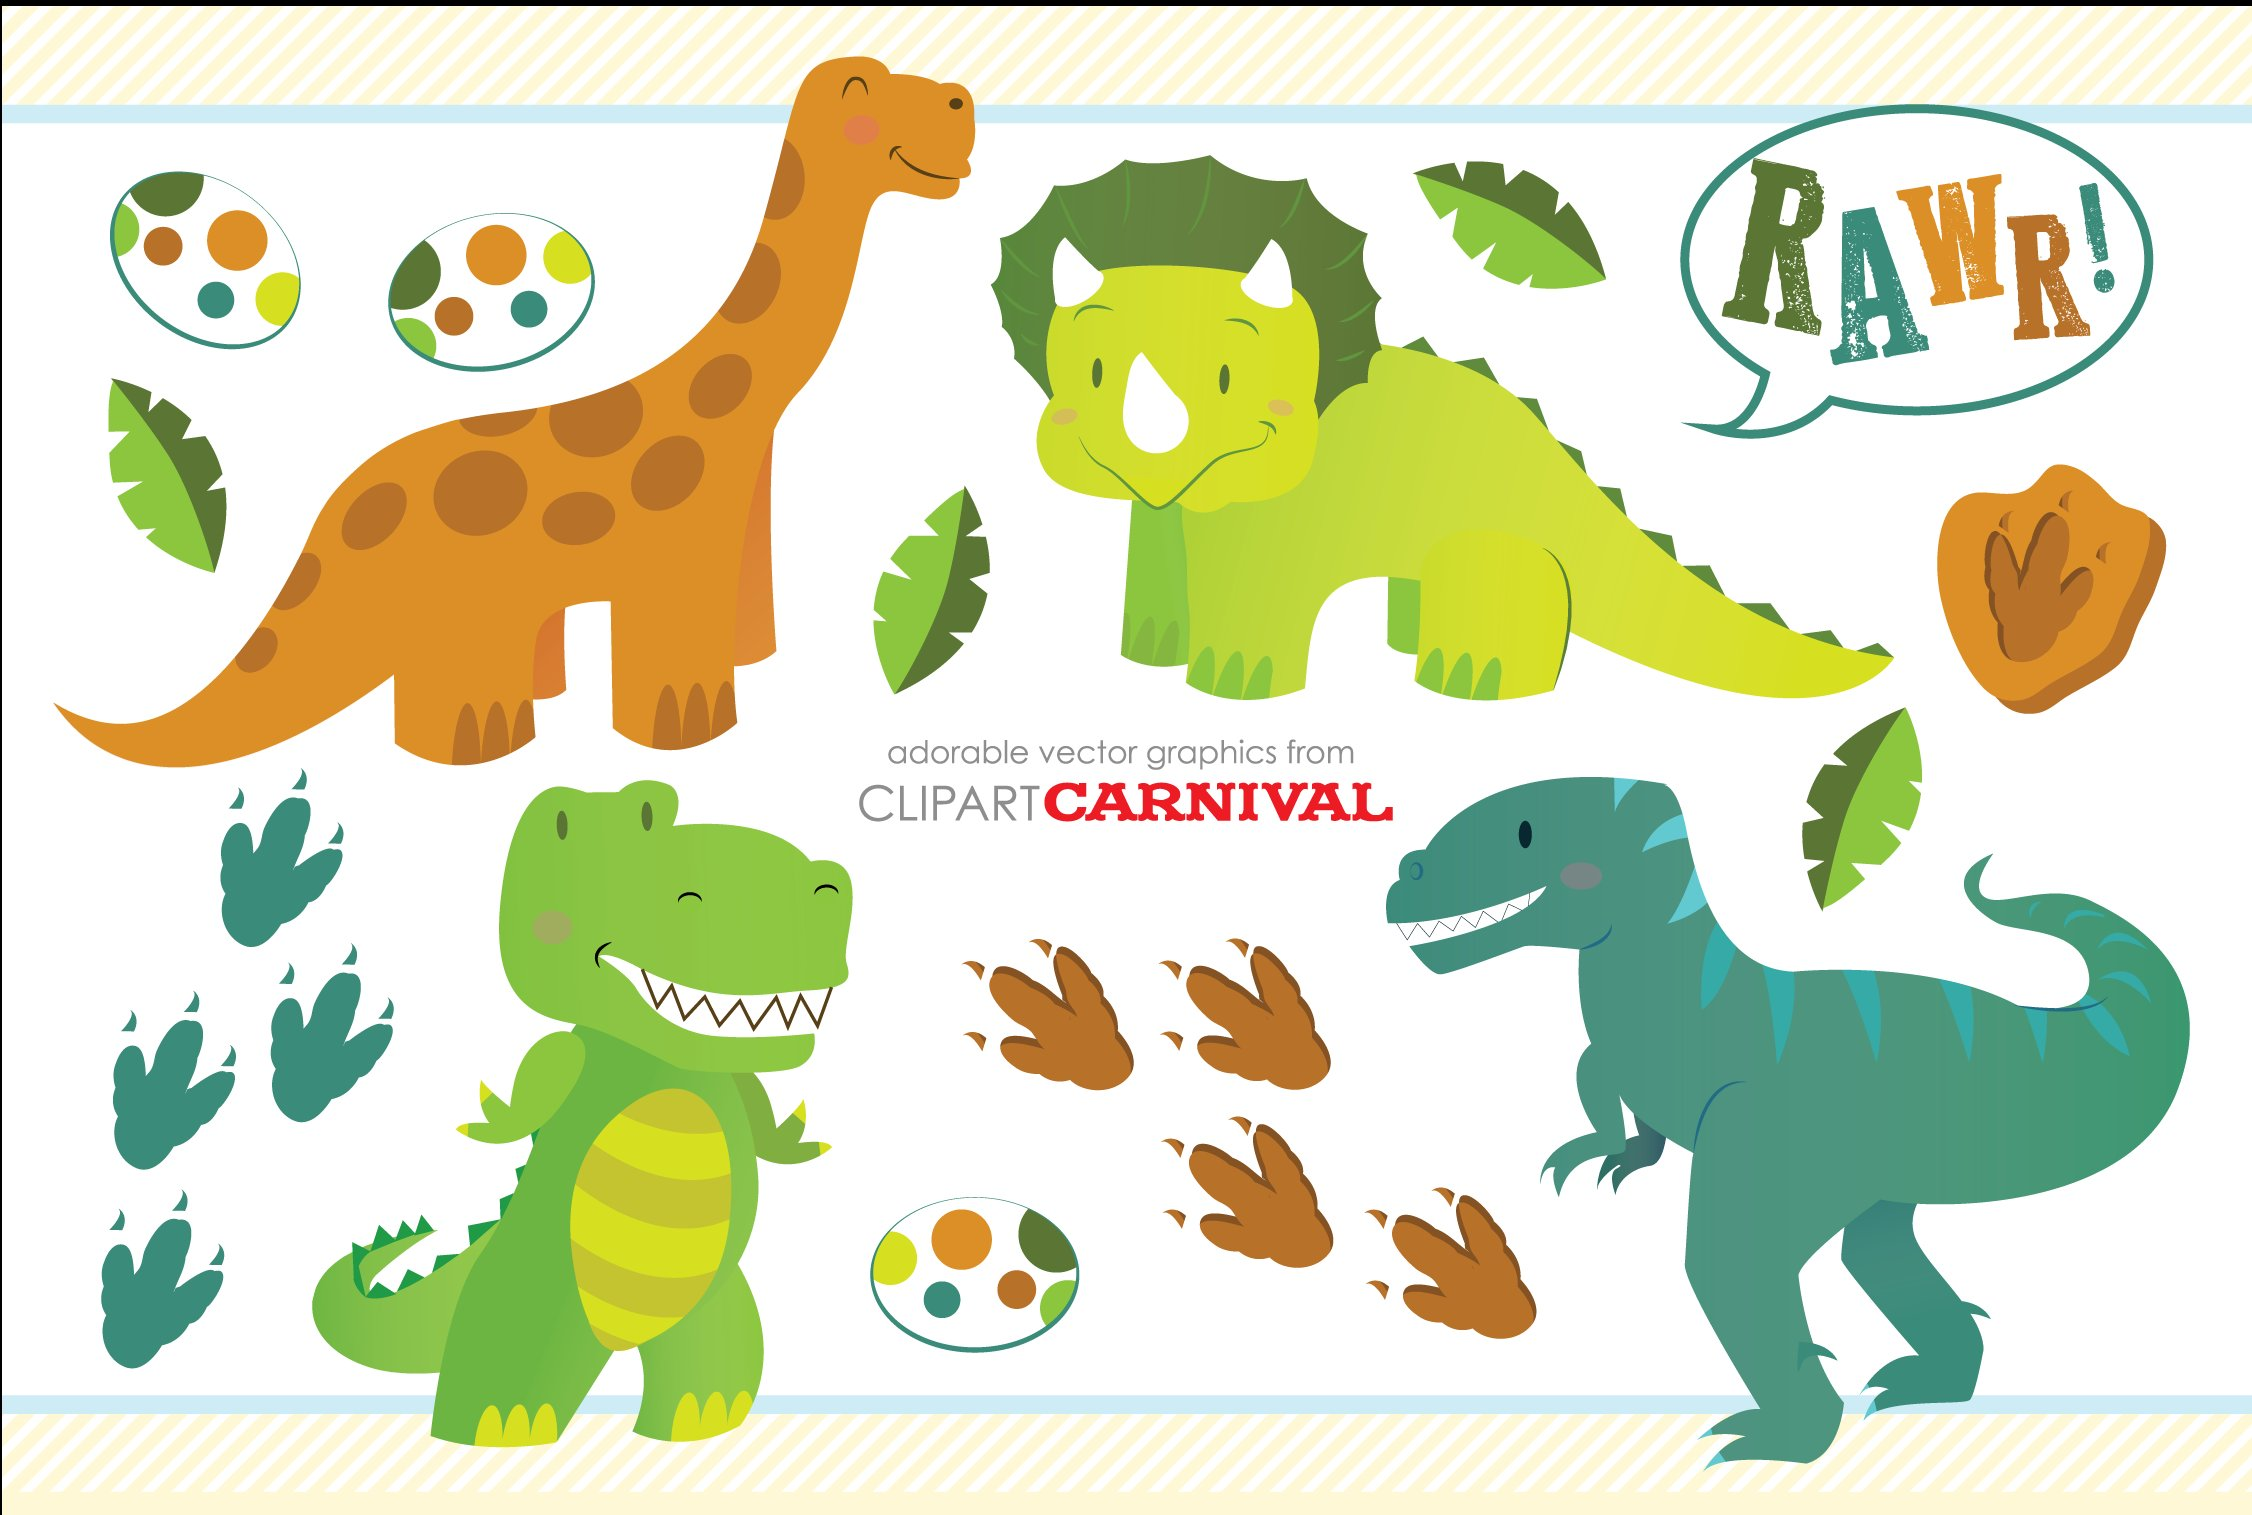 Illustrator Cs2 Stock Illustrations – 61 Illustrator Cs2 Stock  Illustrations, Vectors & Clipart - Dreamstime